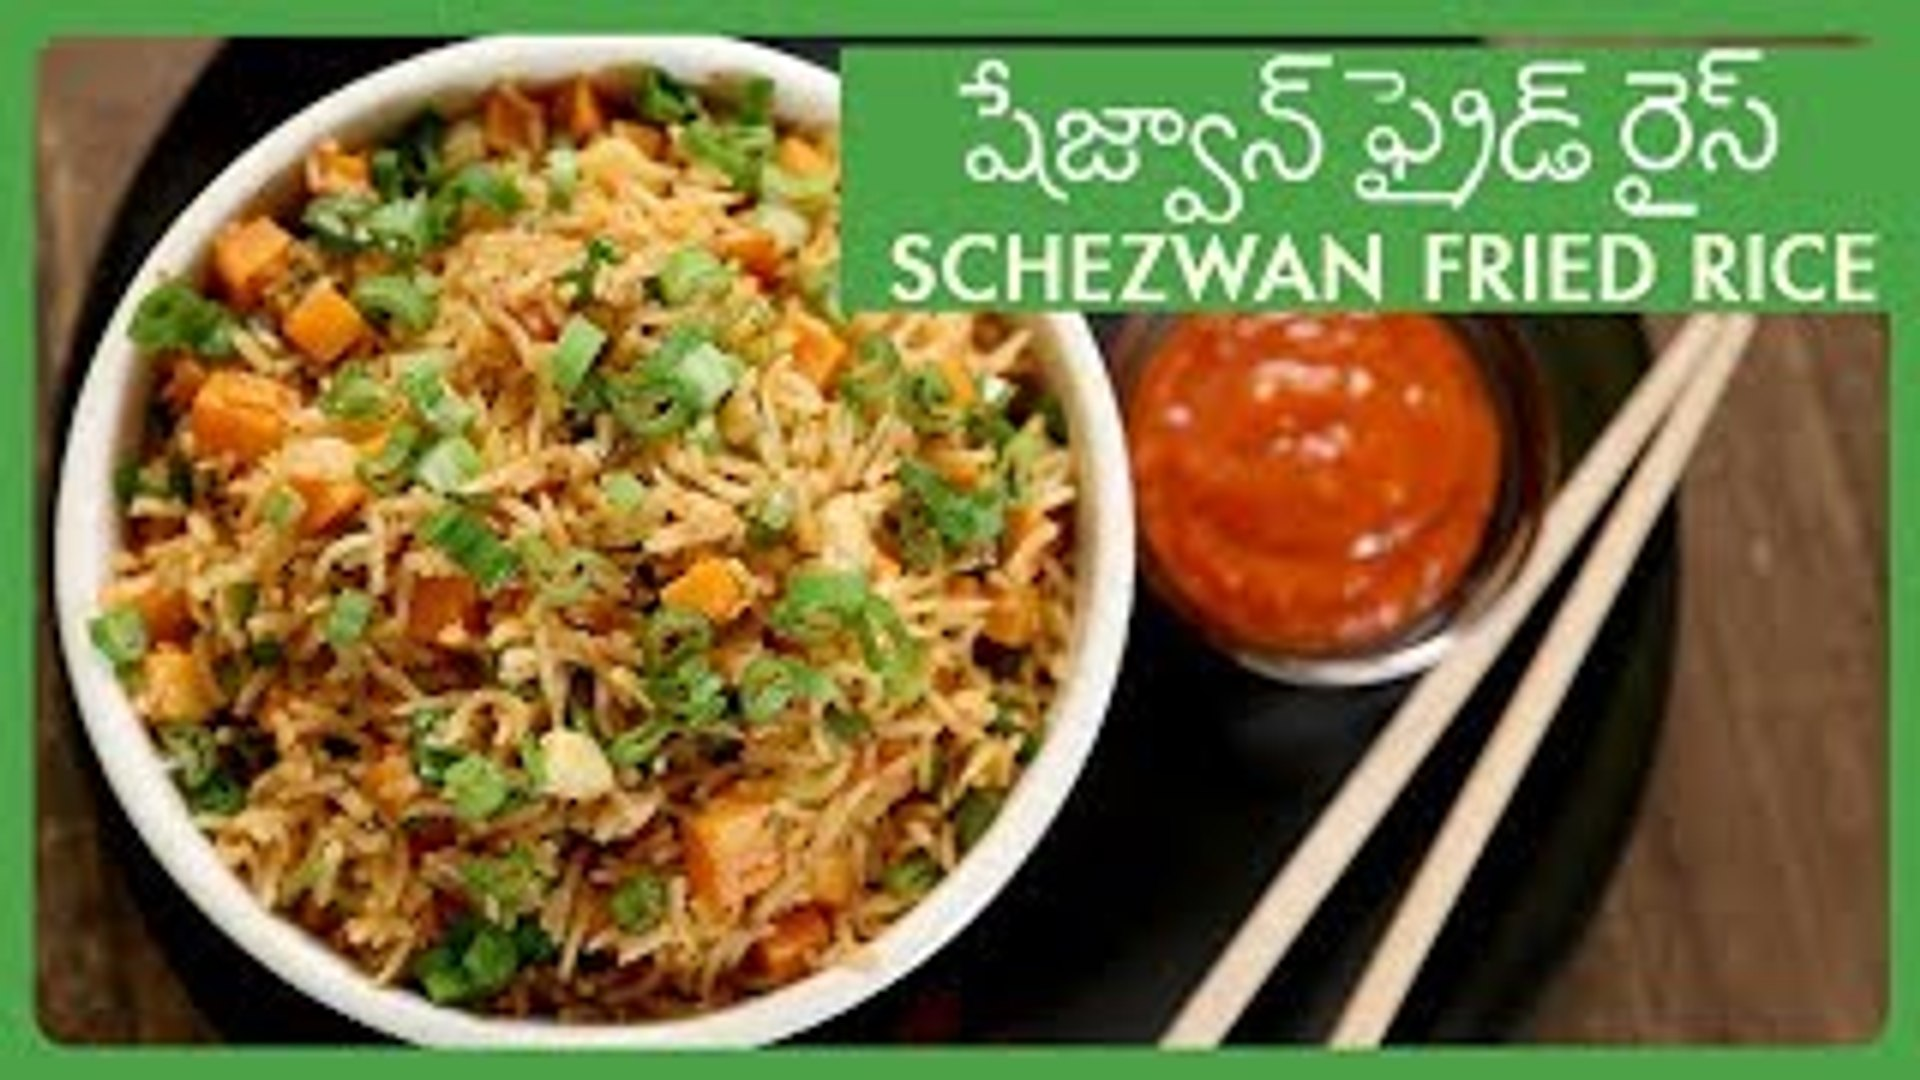 Schezwan Fried Rice Recipe In Telugu | Chinese Fried Rice Recipe At Home | షేజ్వాన్ ఫ్రైడ్ రైస్